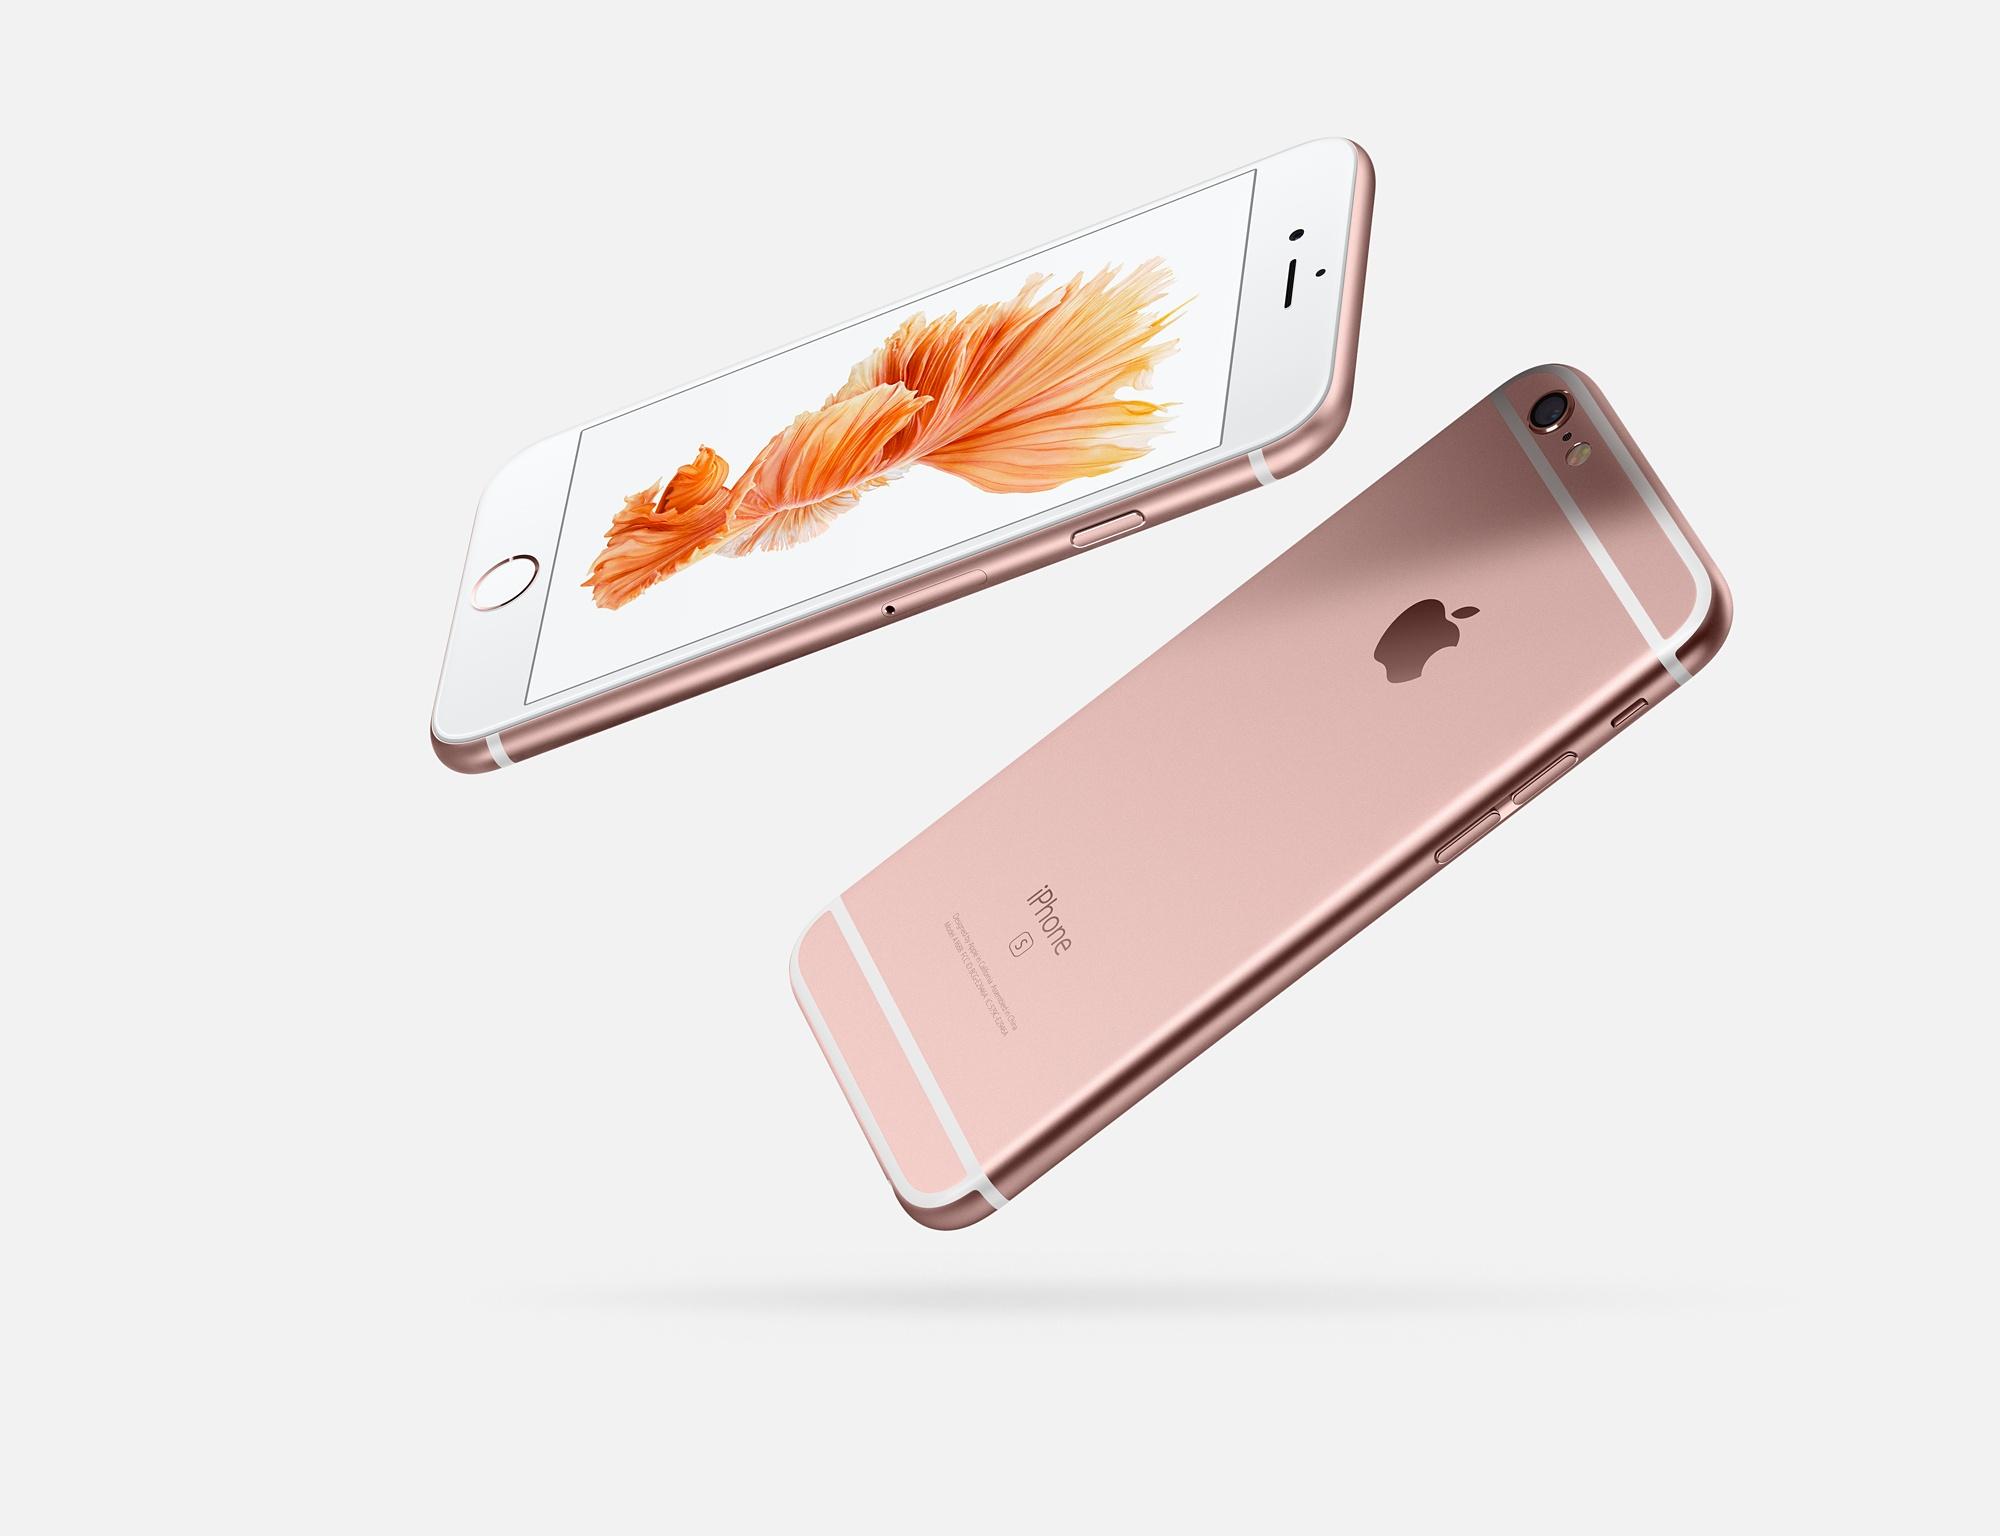 iphone6s-gallery1-2015